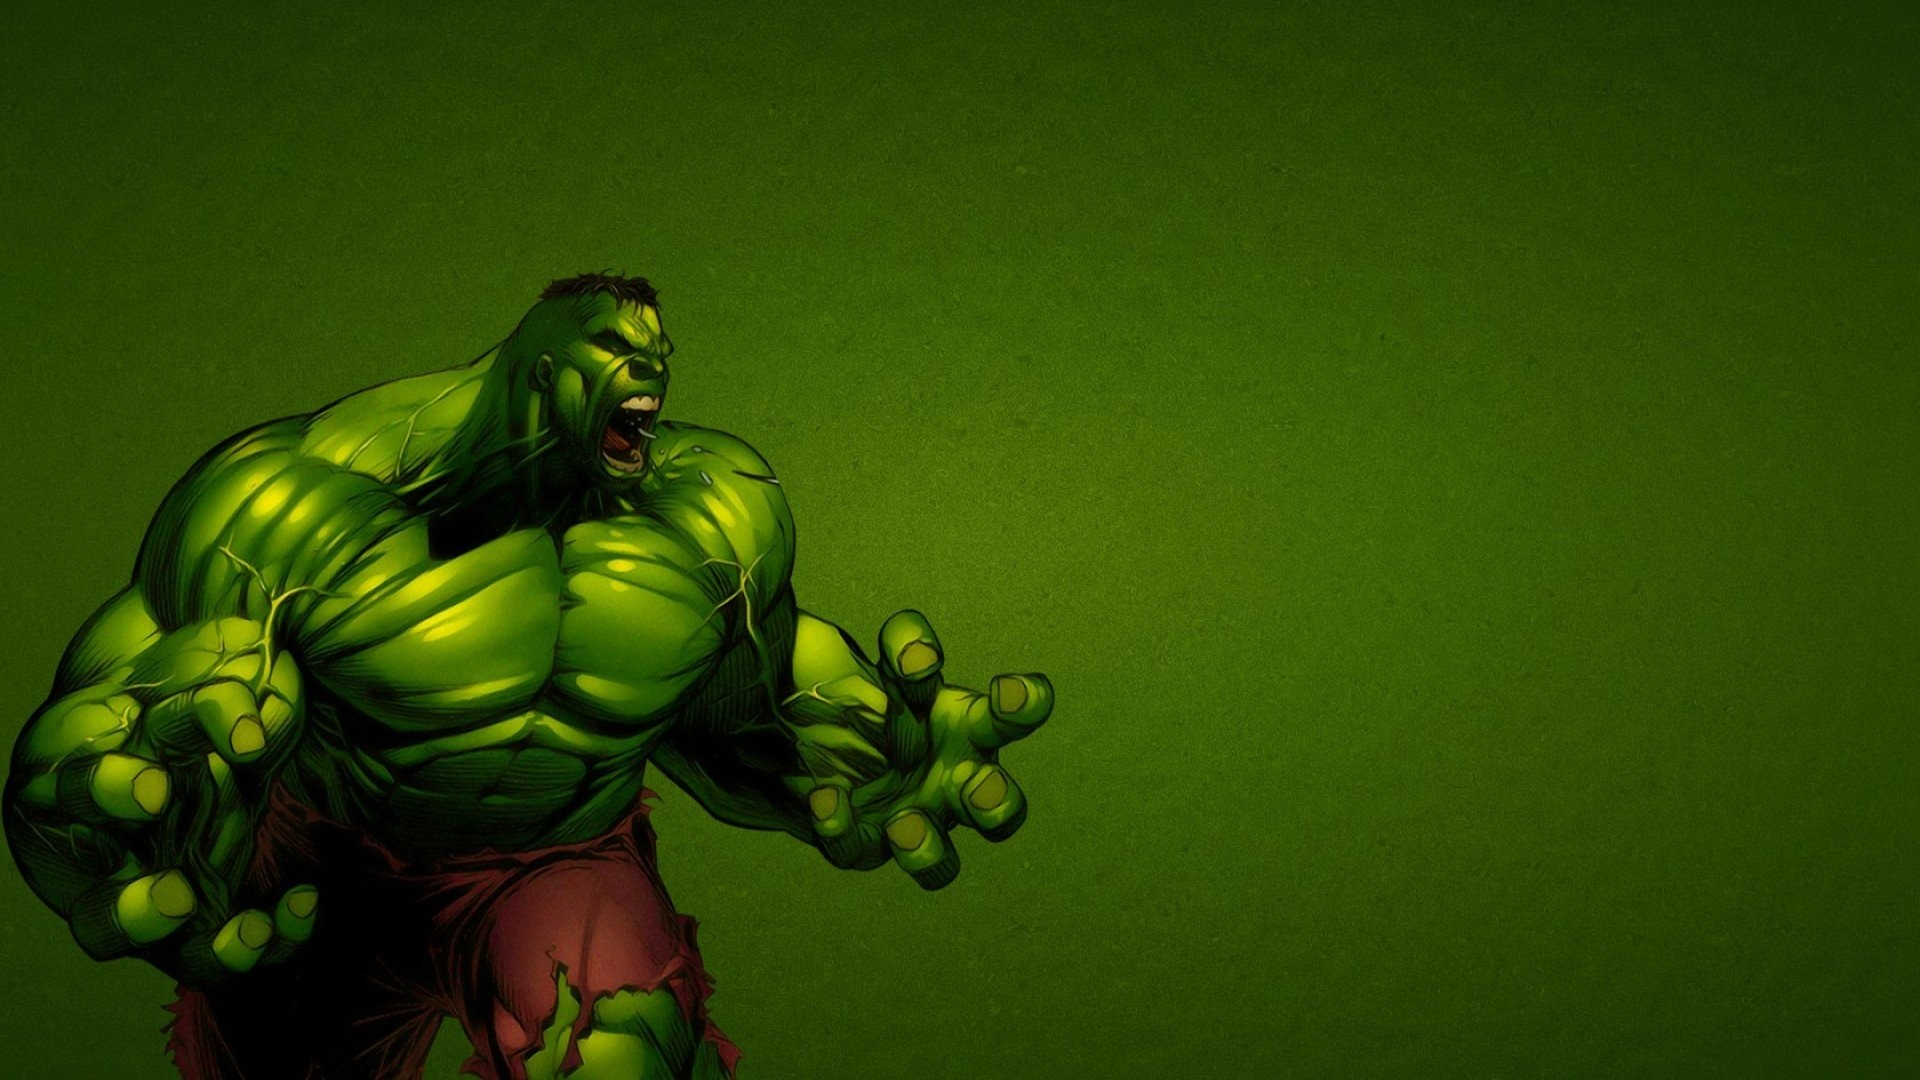 HD Hulk Wallpaper (74+ Images